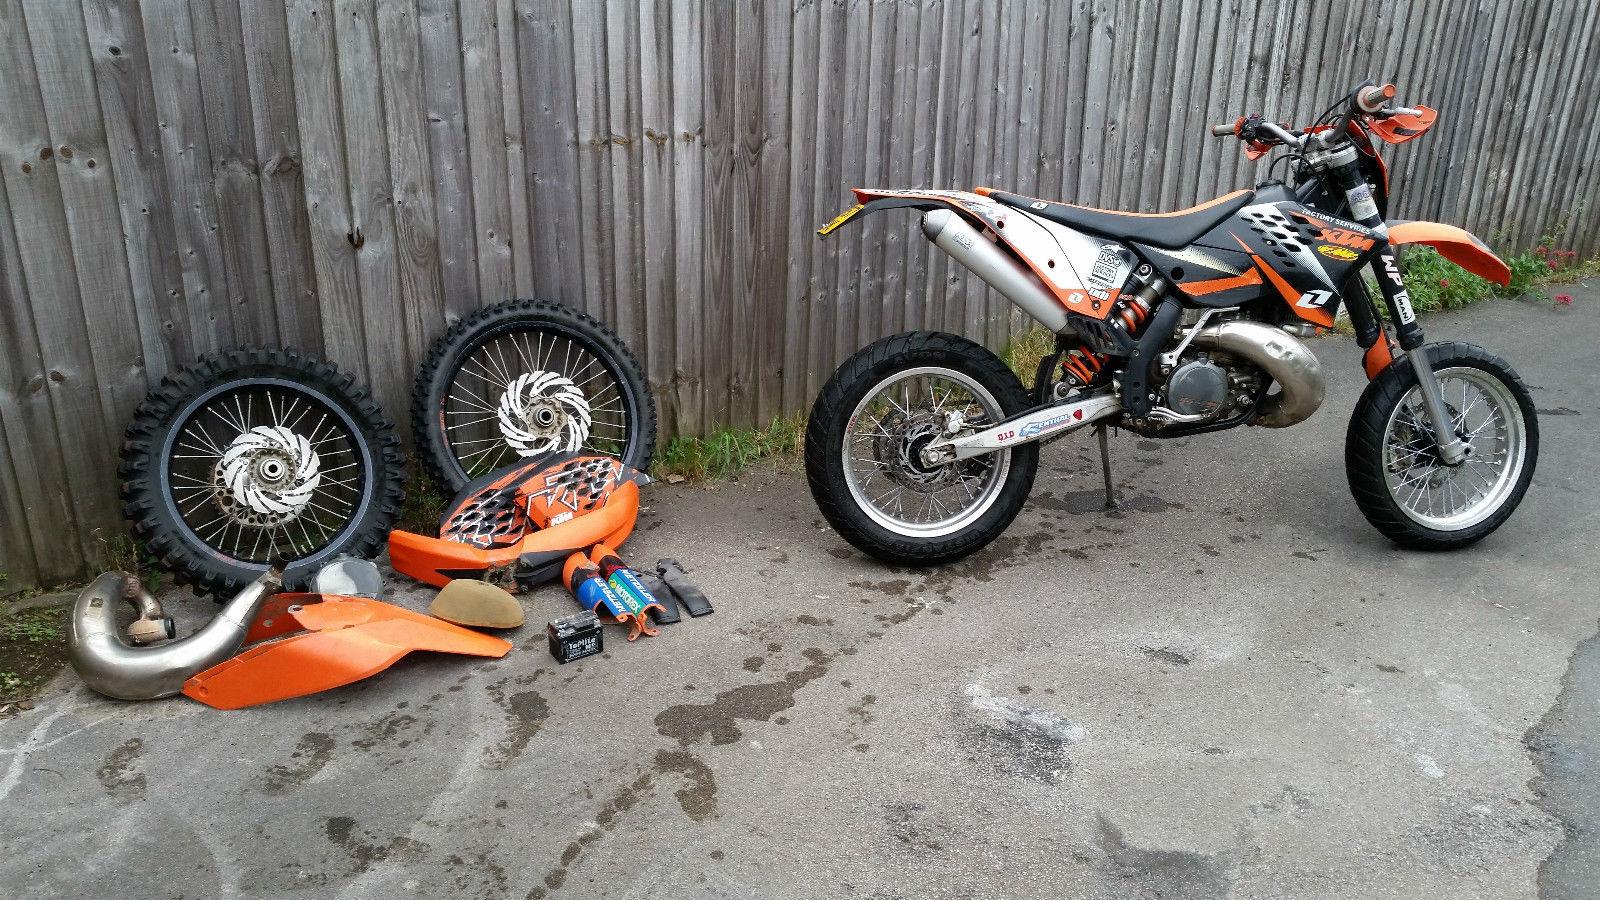 2008 ktm 300 exc orange supermoto motocross. Black Bedroom Furniture Sets. Home Design Ideas